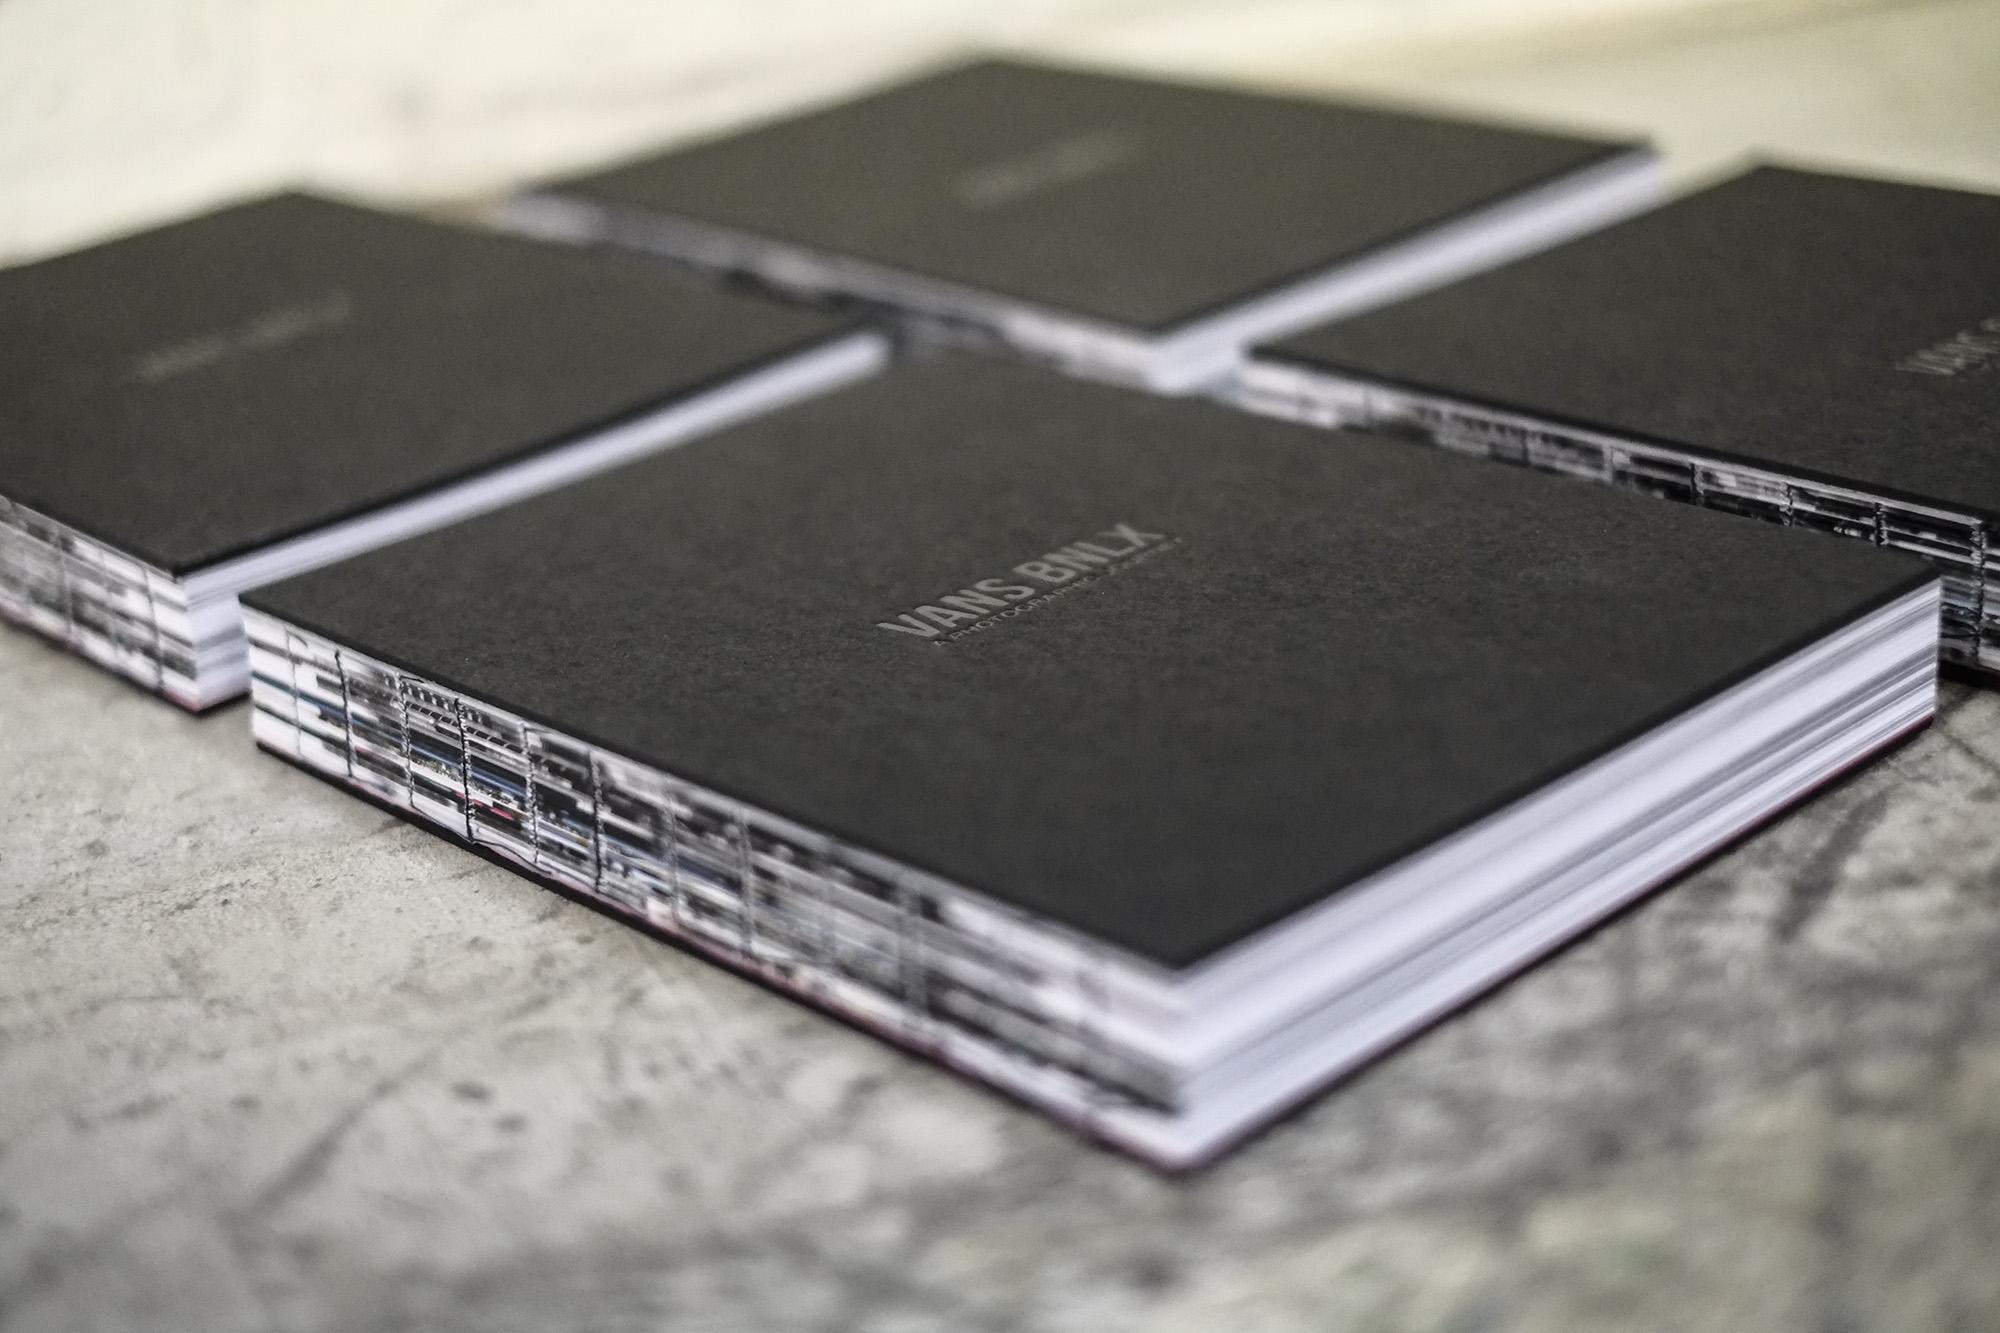 The-Vans-Bnlx-Book-06